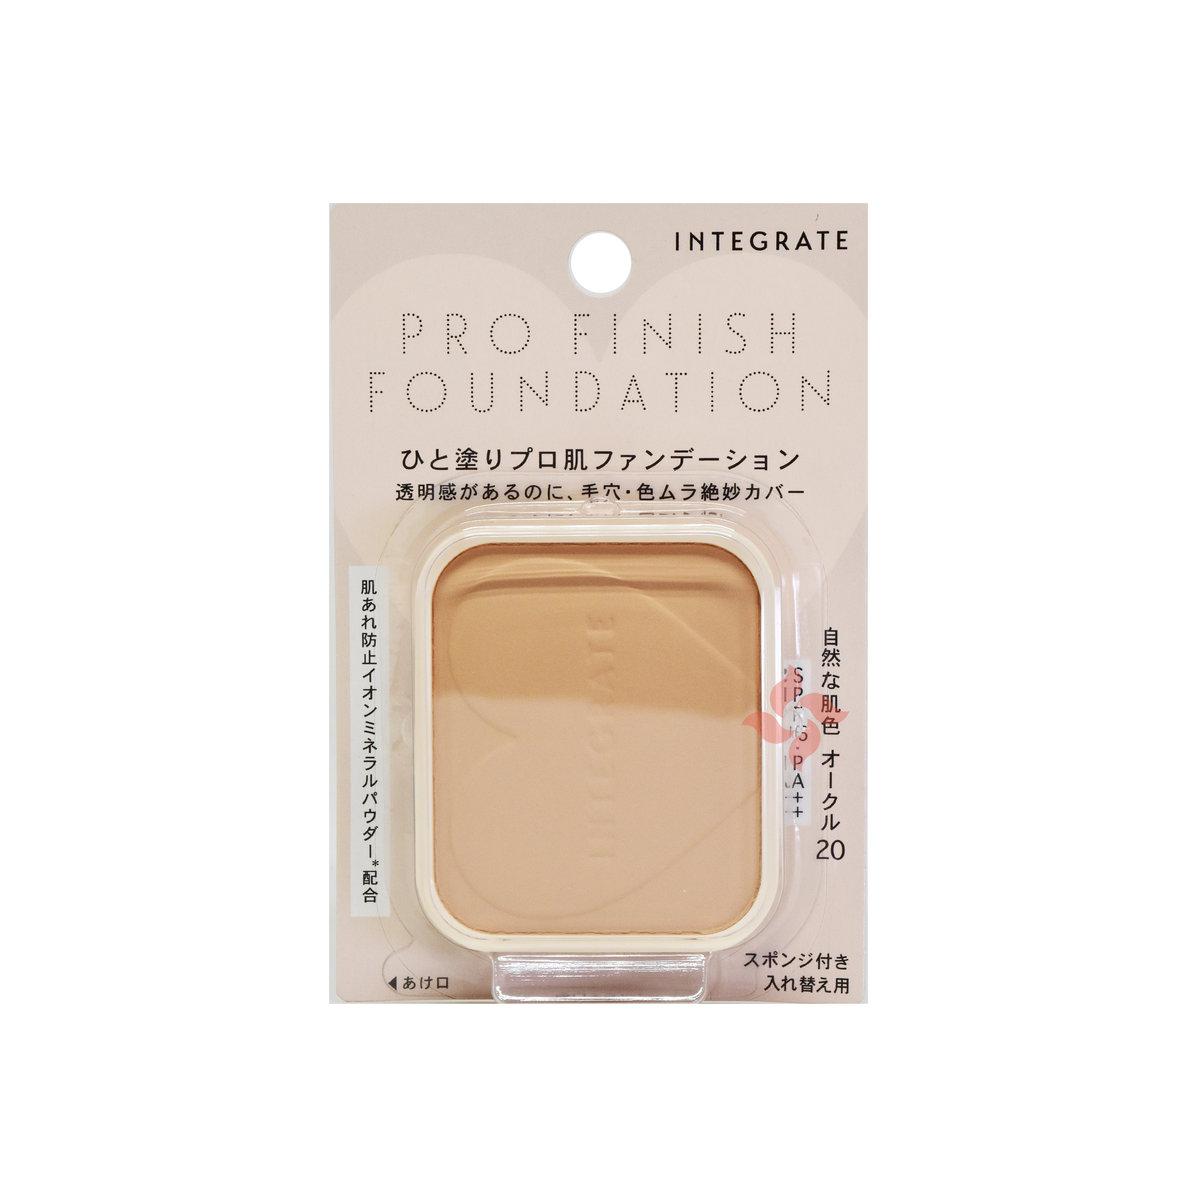 Integrate Gracy 完美意境粉芯 SPF16/PA++10g OC-20 自然膚色(4901872055500)